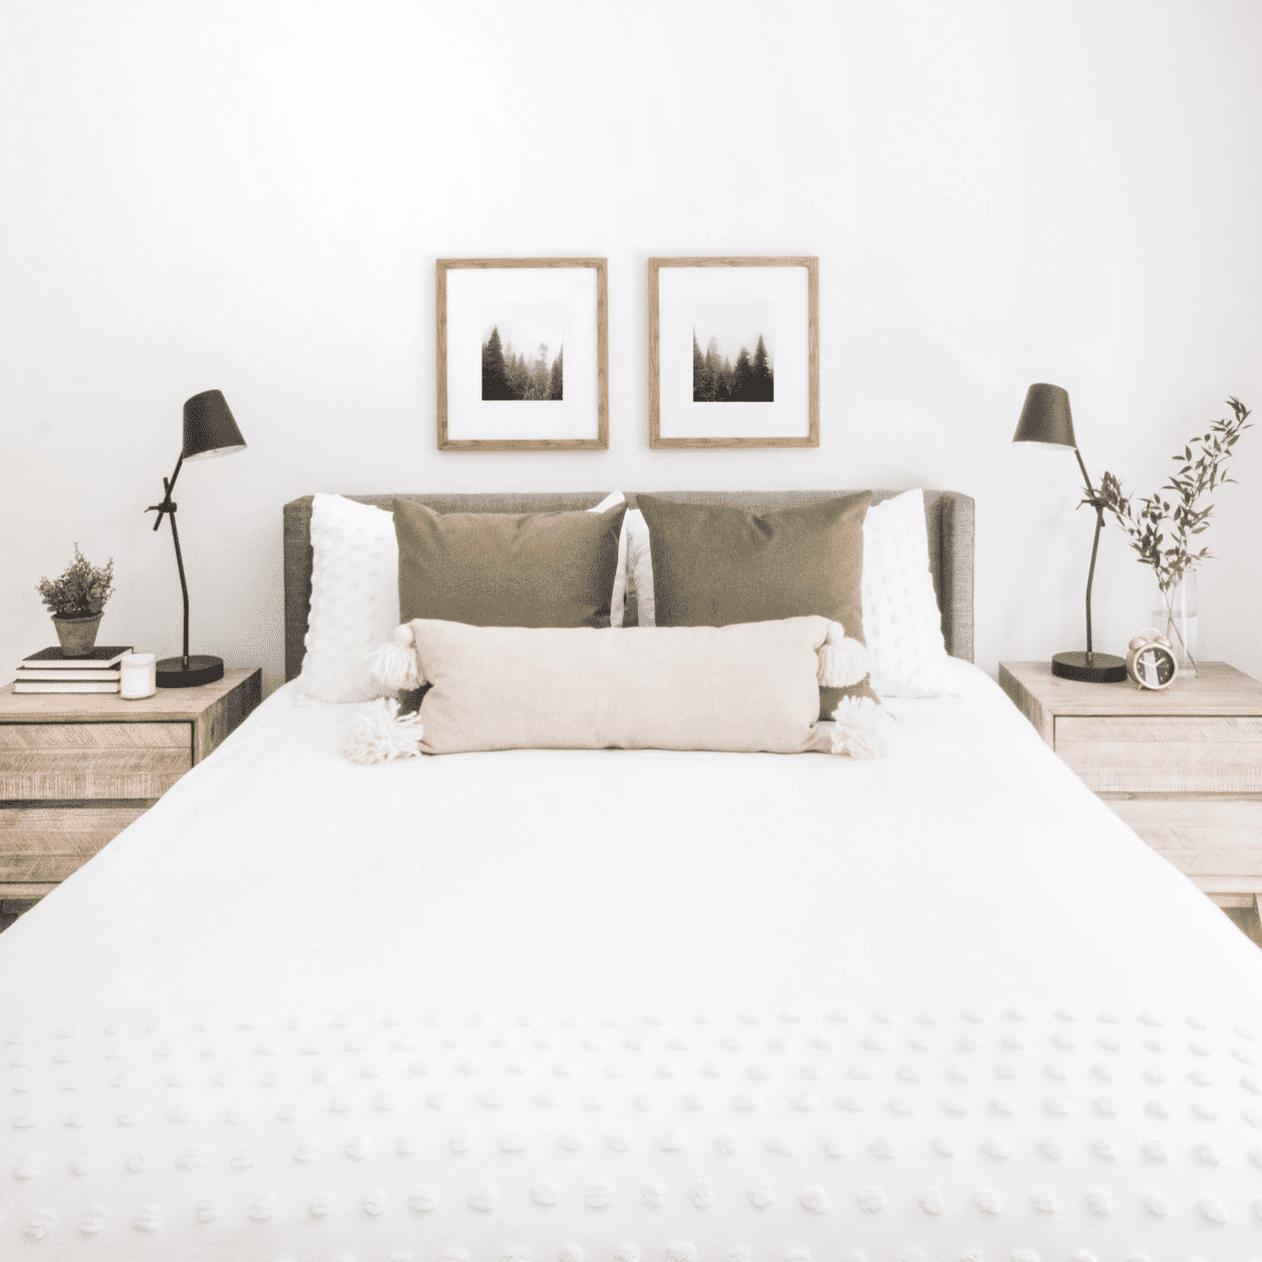 a minimalist bedroom with sleek modern desk lamps